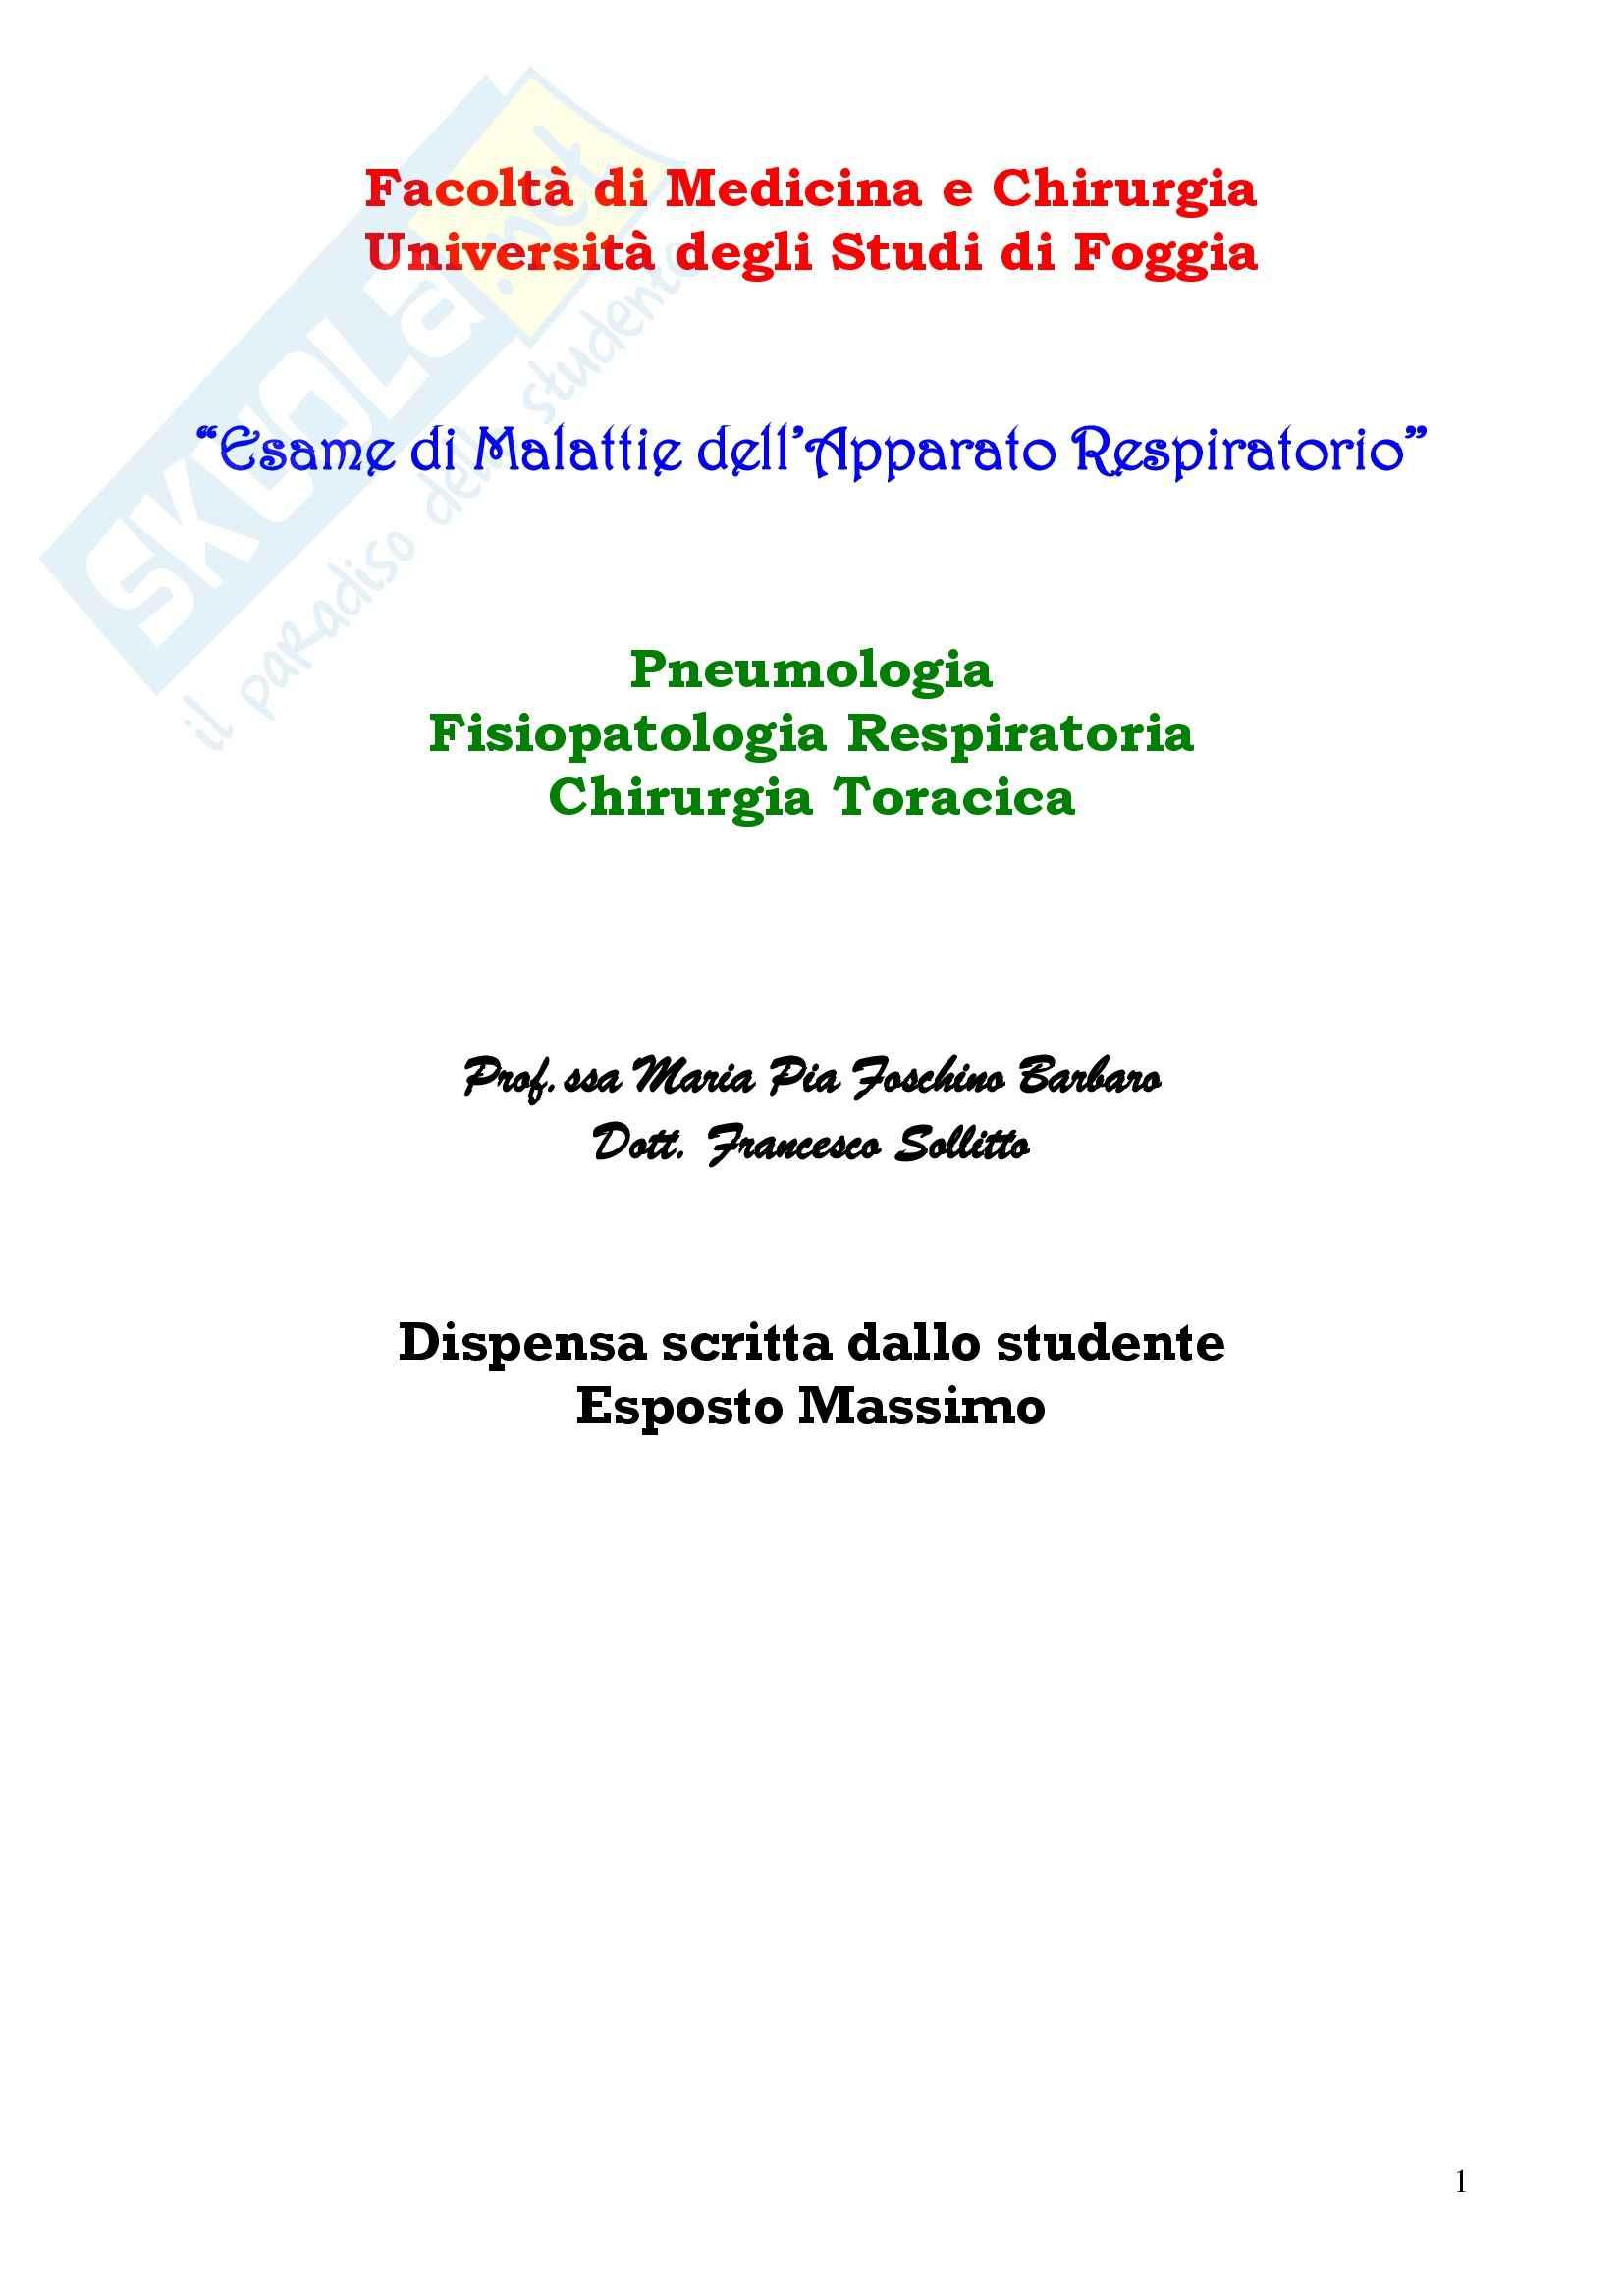 appunto M. Foschino Malattie Apparato Respiratorio